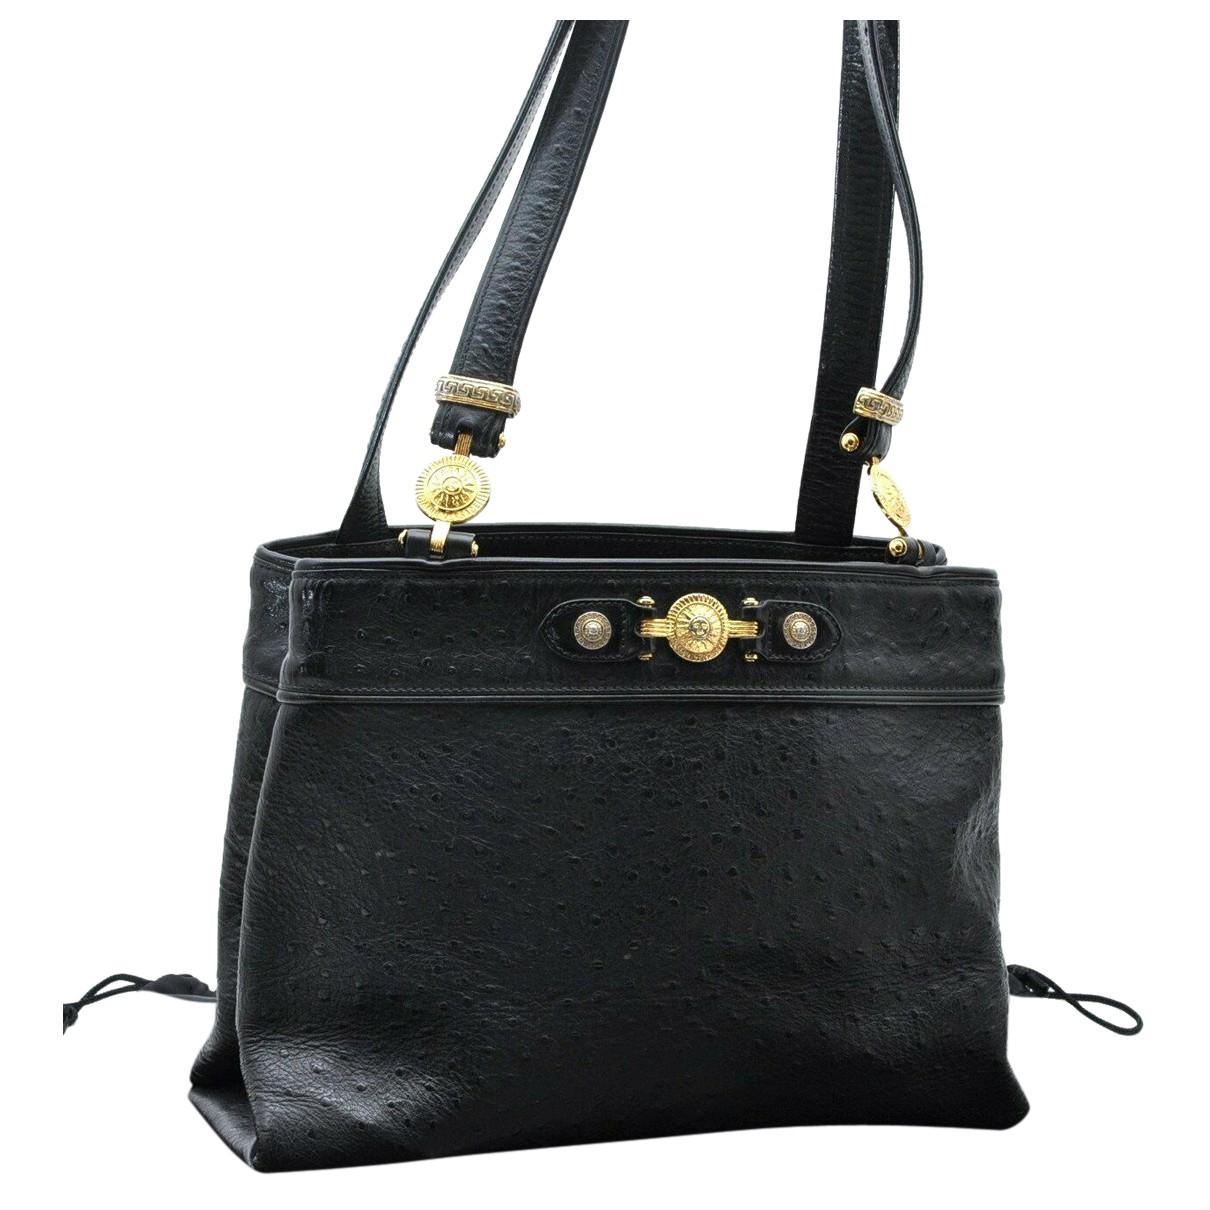 Gianni Versace N Black Leather handbag for Women N